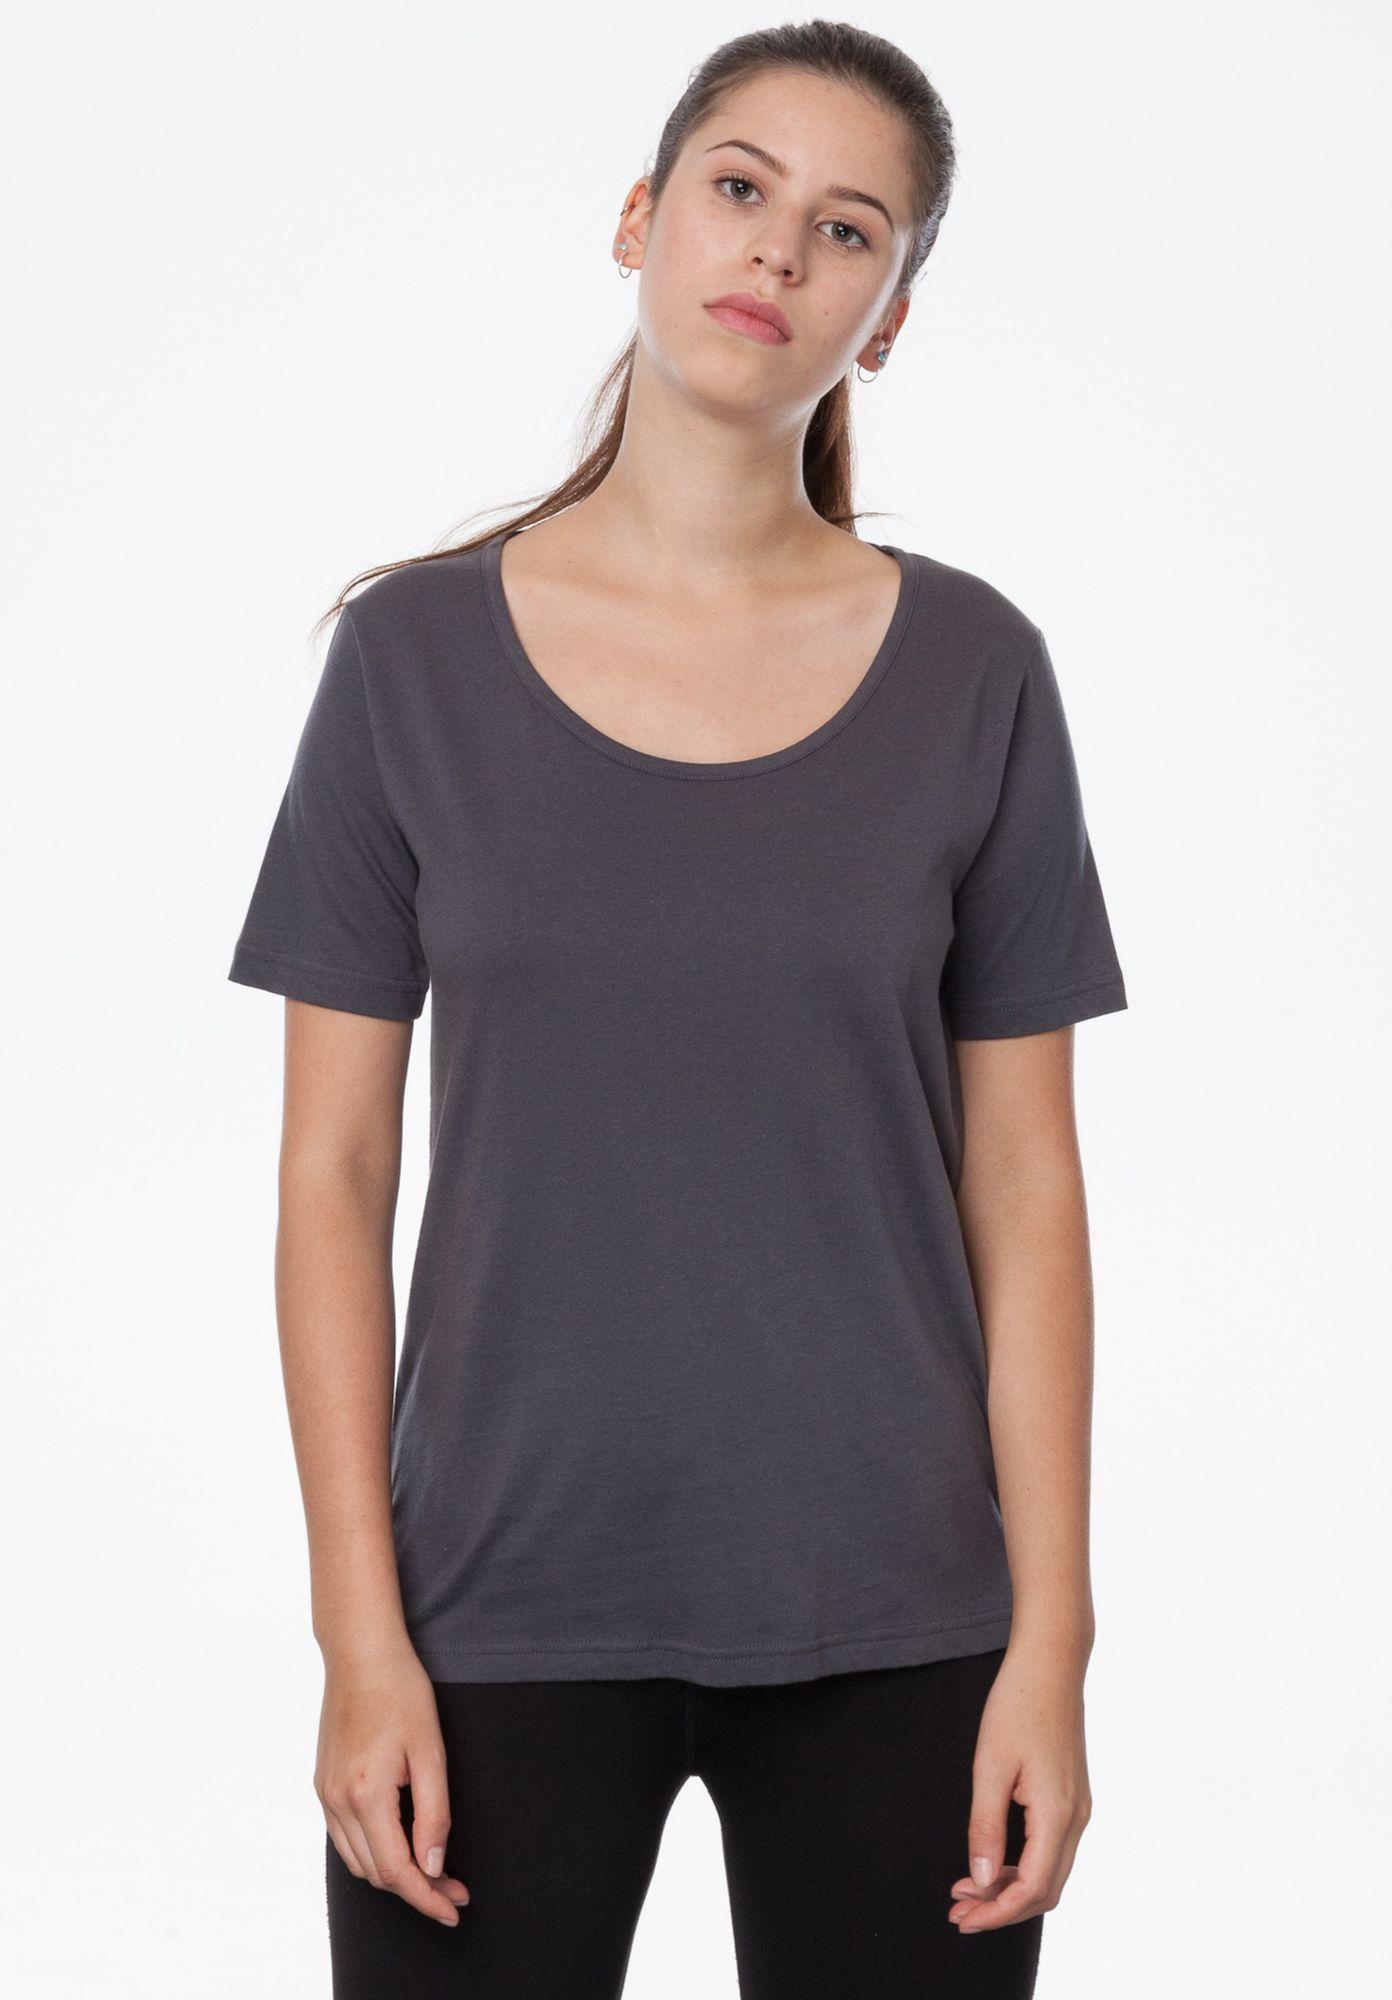 TT64 T-Shirt Asphalt